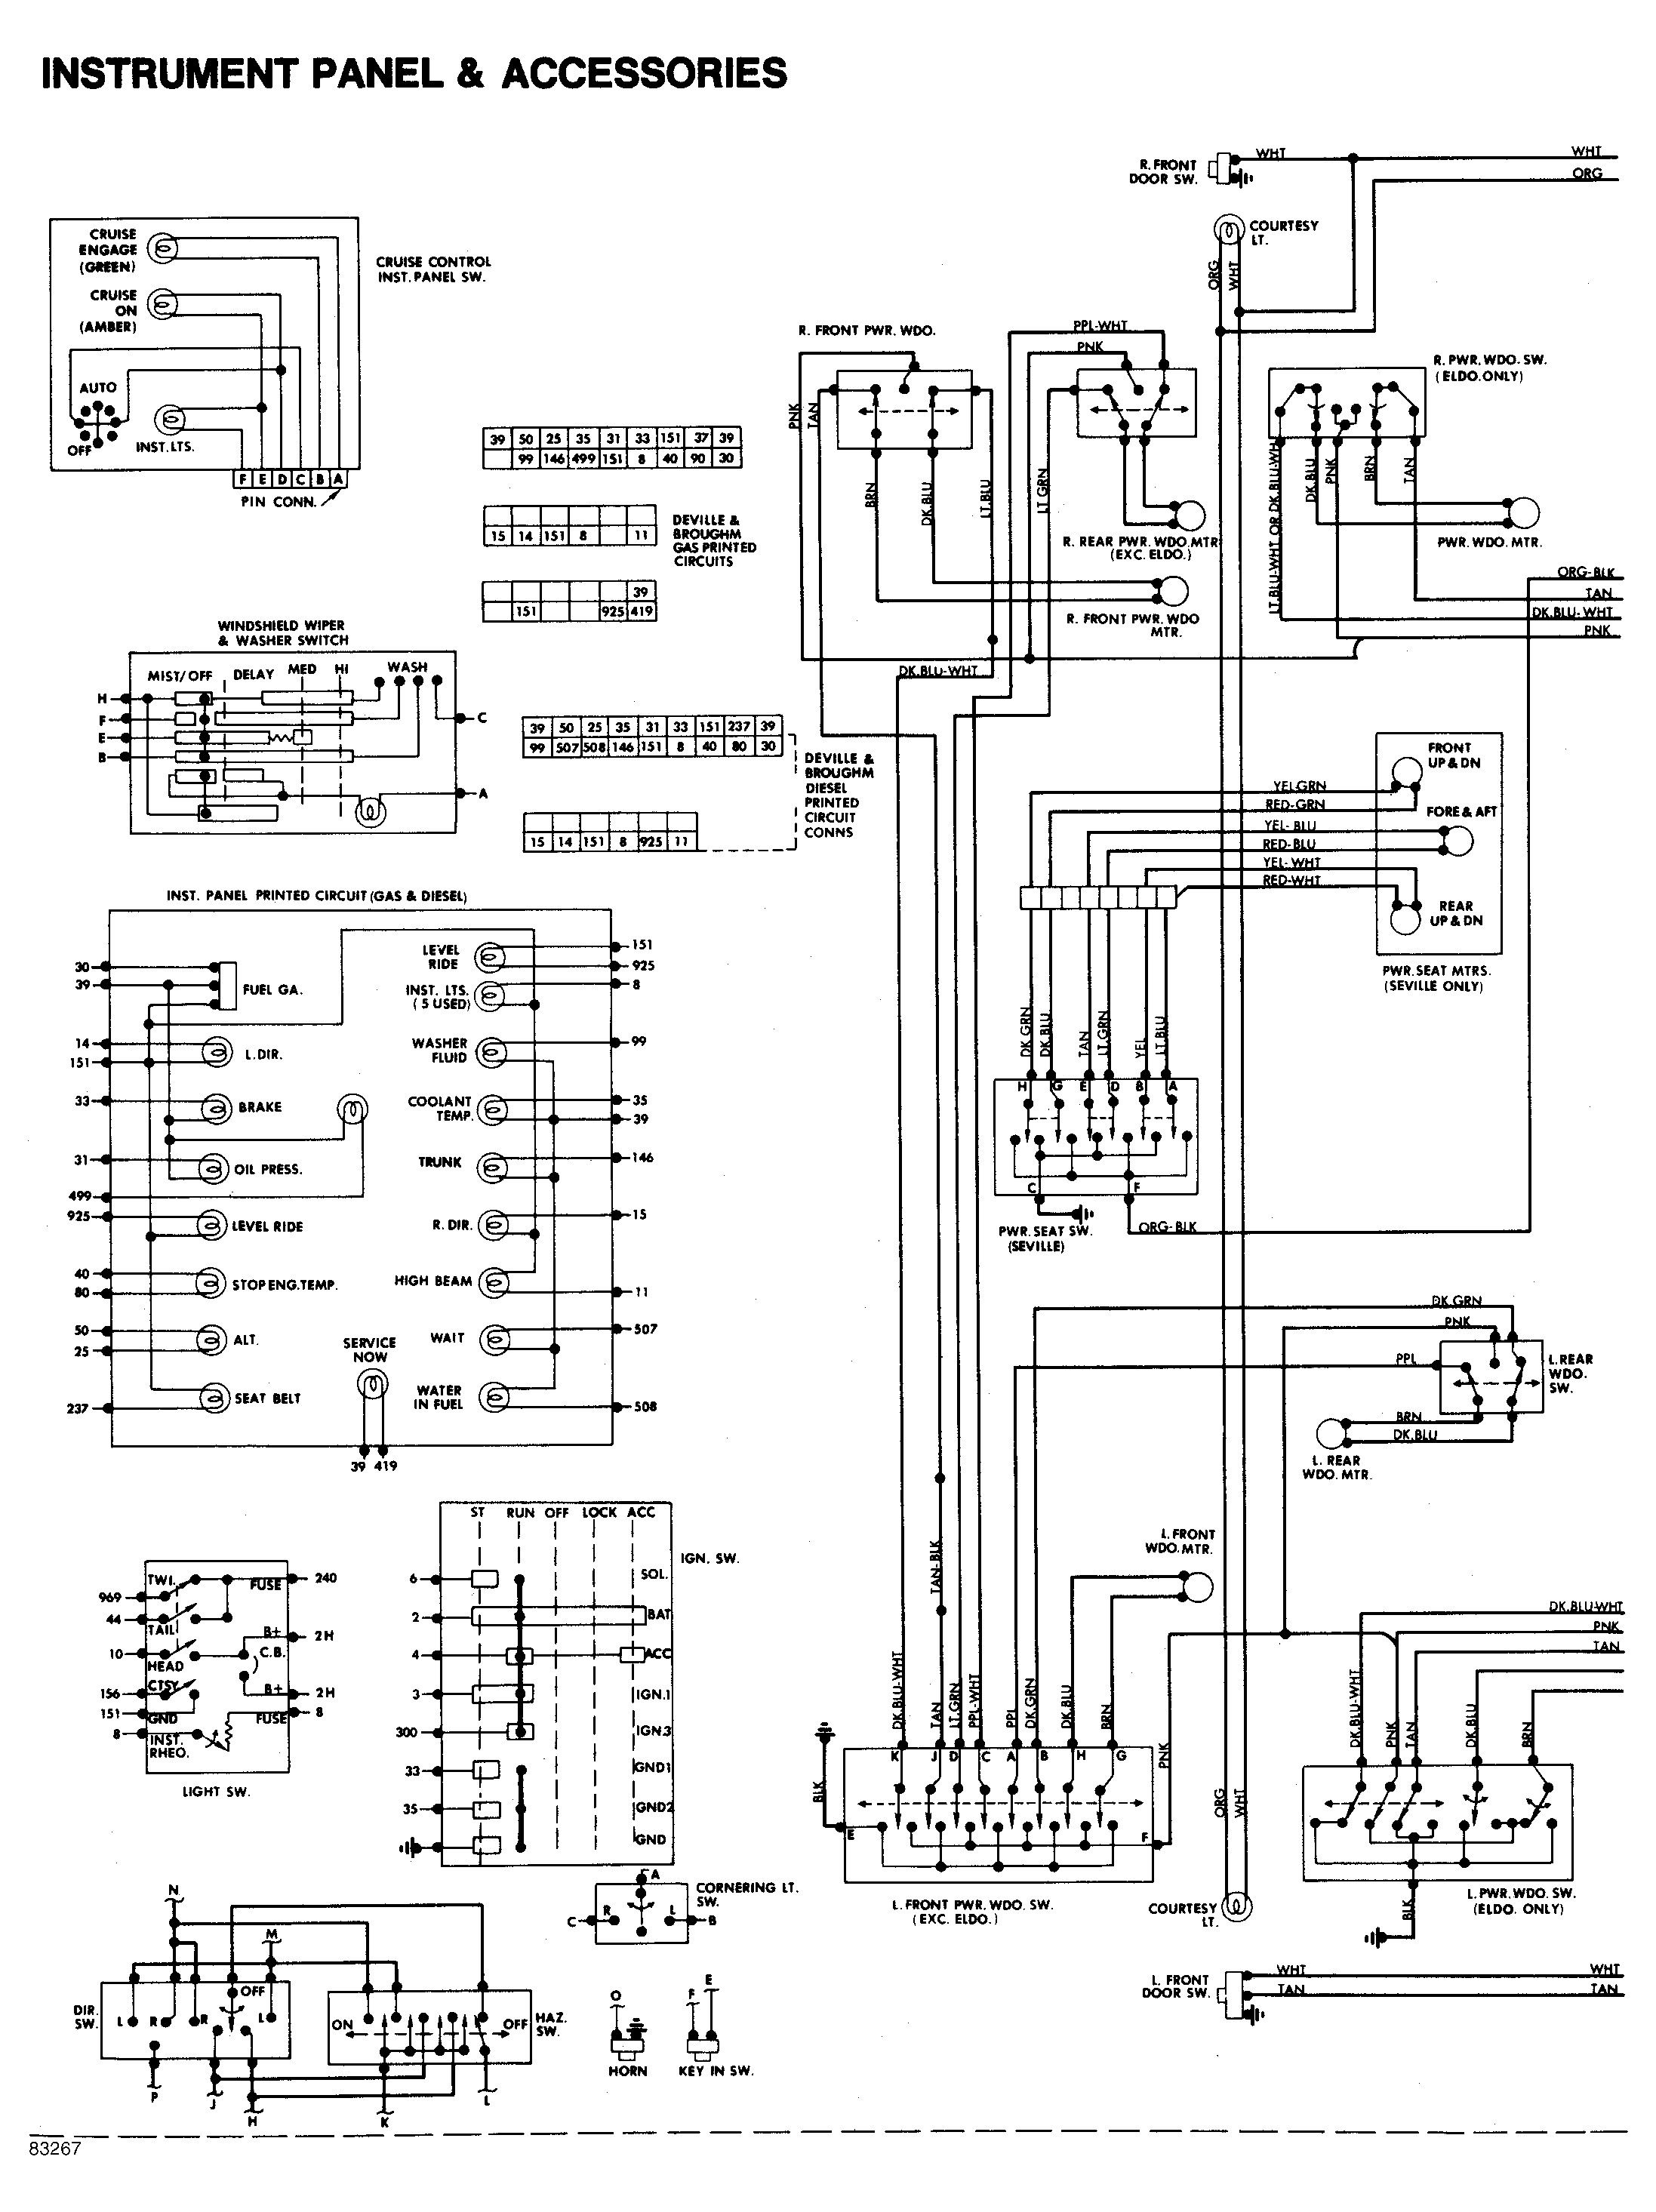 Daewoo Wiring Diagram Radio Manual E Books Nissan Bose Harness Diagramdaewoo Diagrams Diagramsdaewoo Stereo